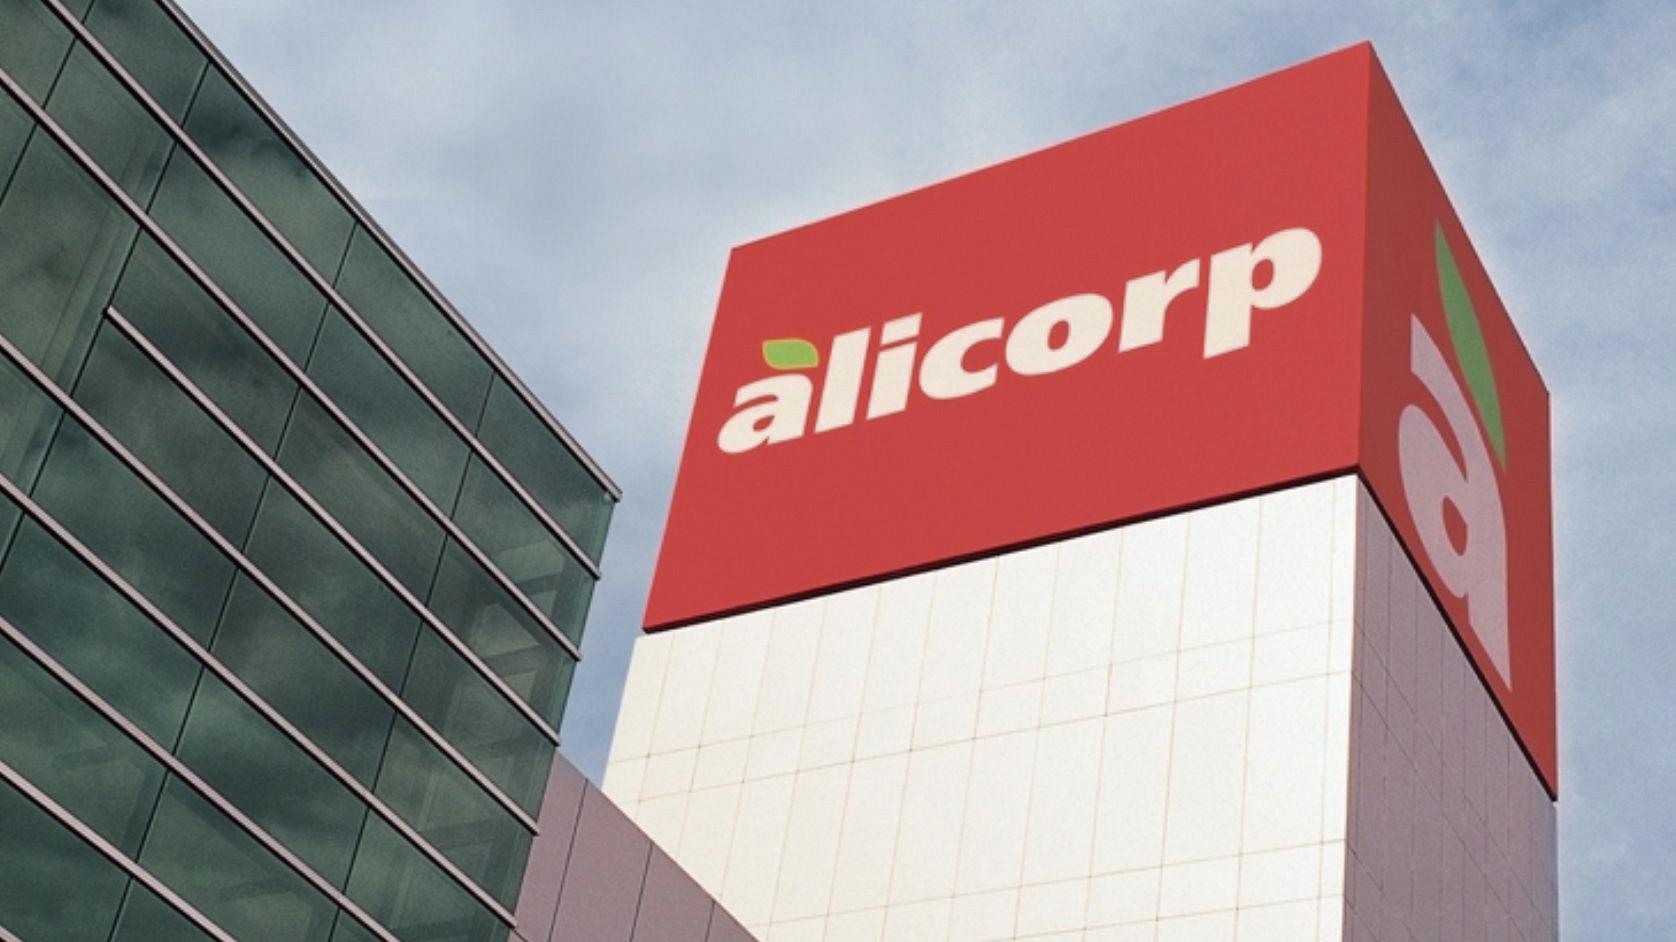 <p>Alicorp tuvo un primer trimestre positivo pese al alza de materias primas</p>